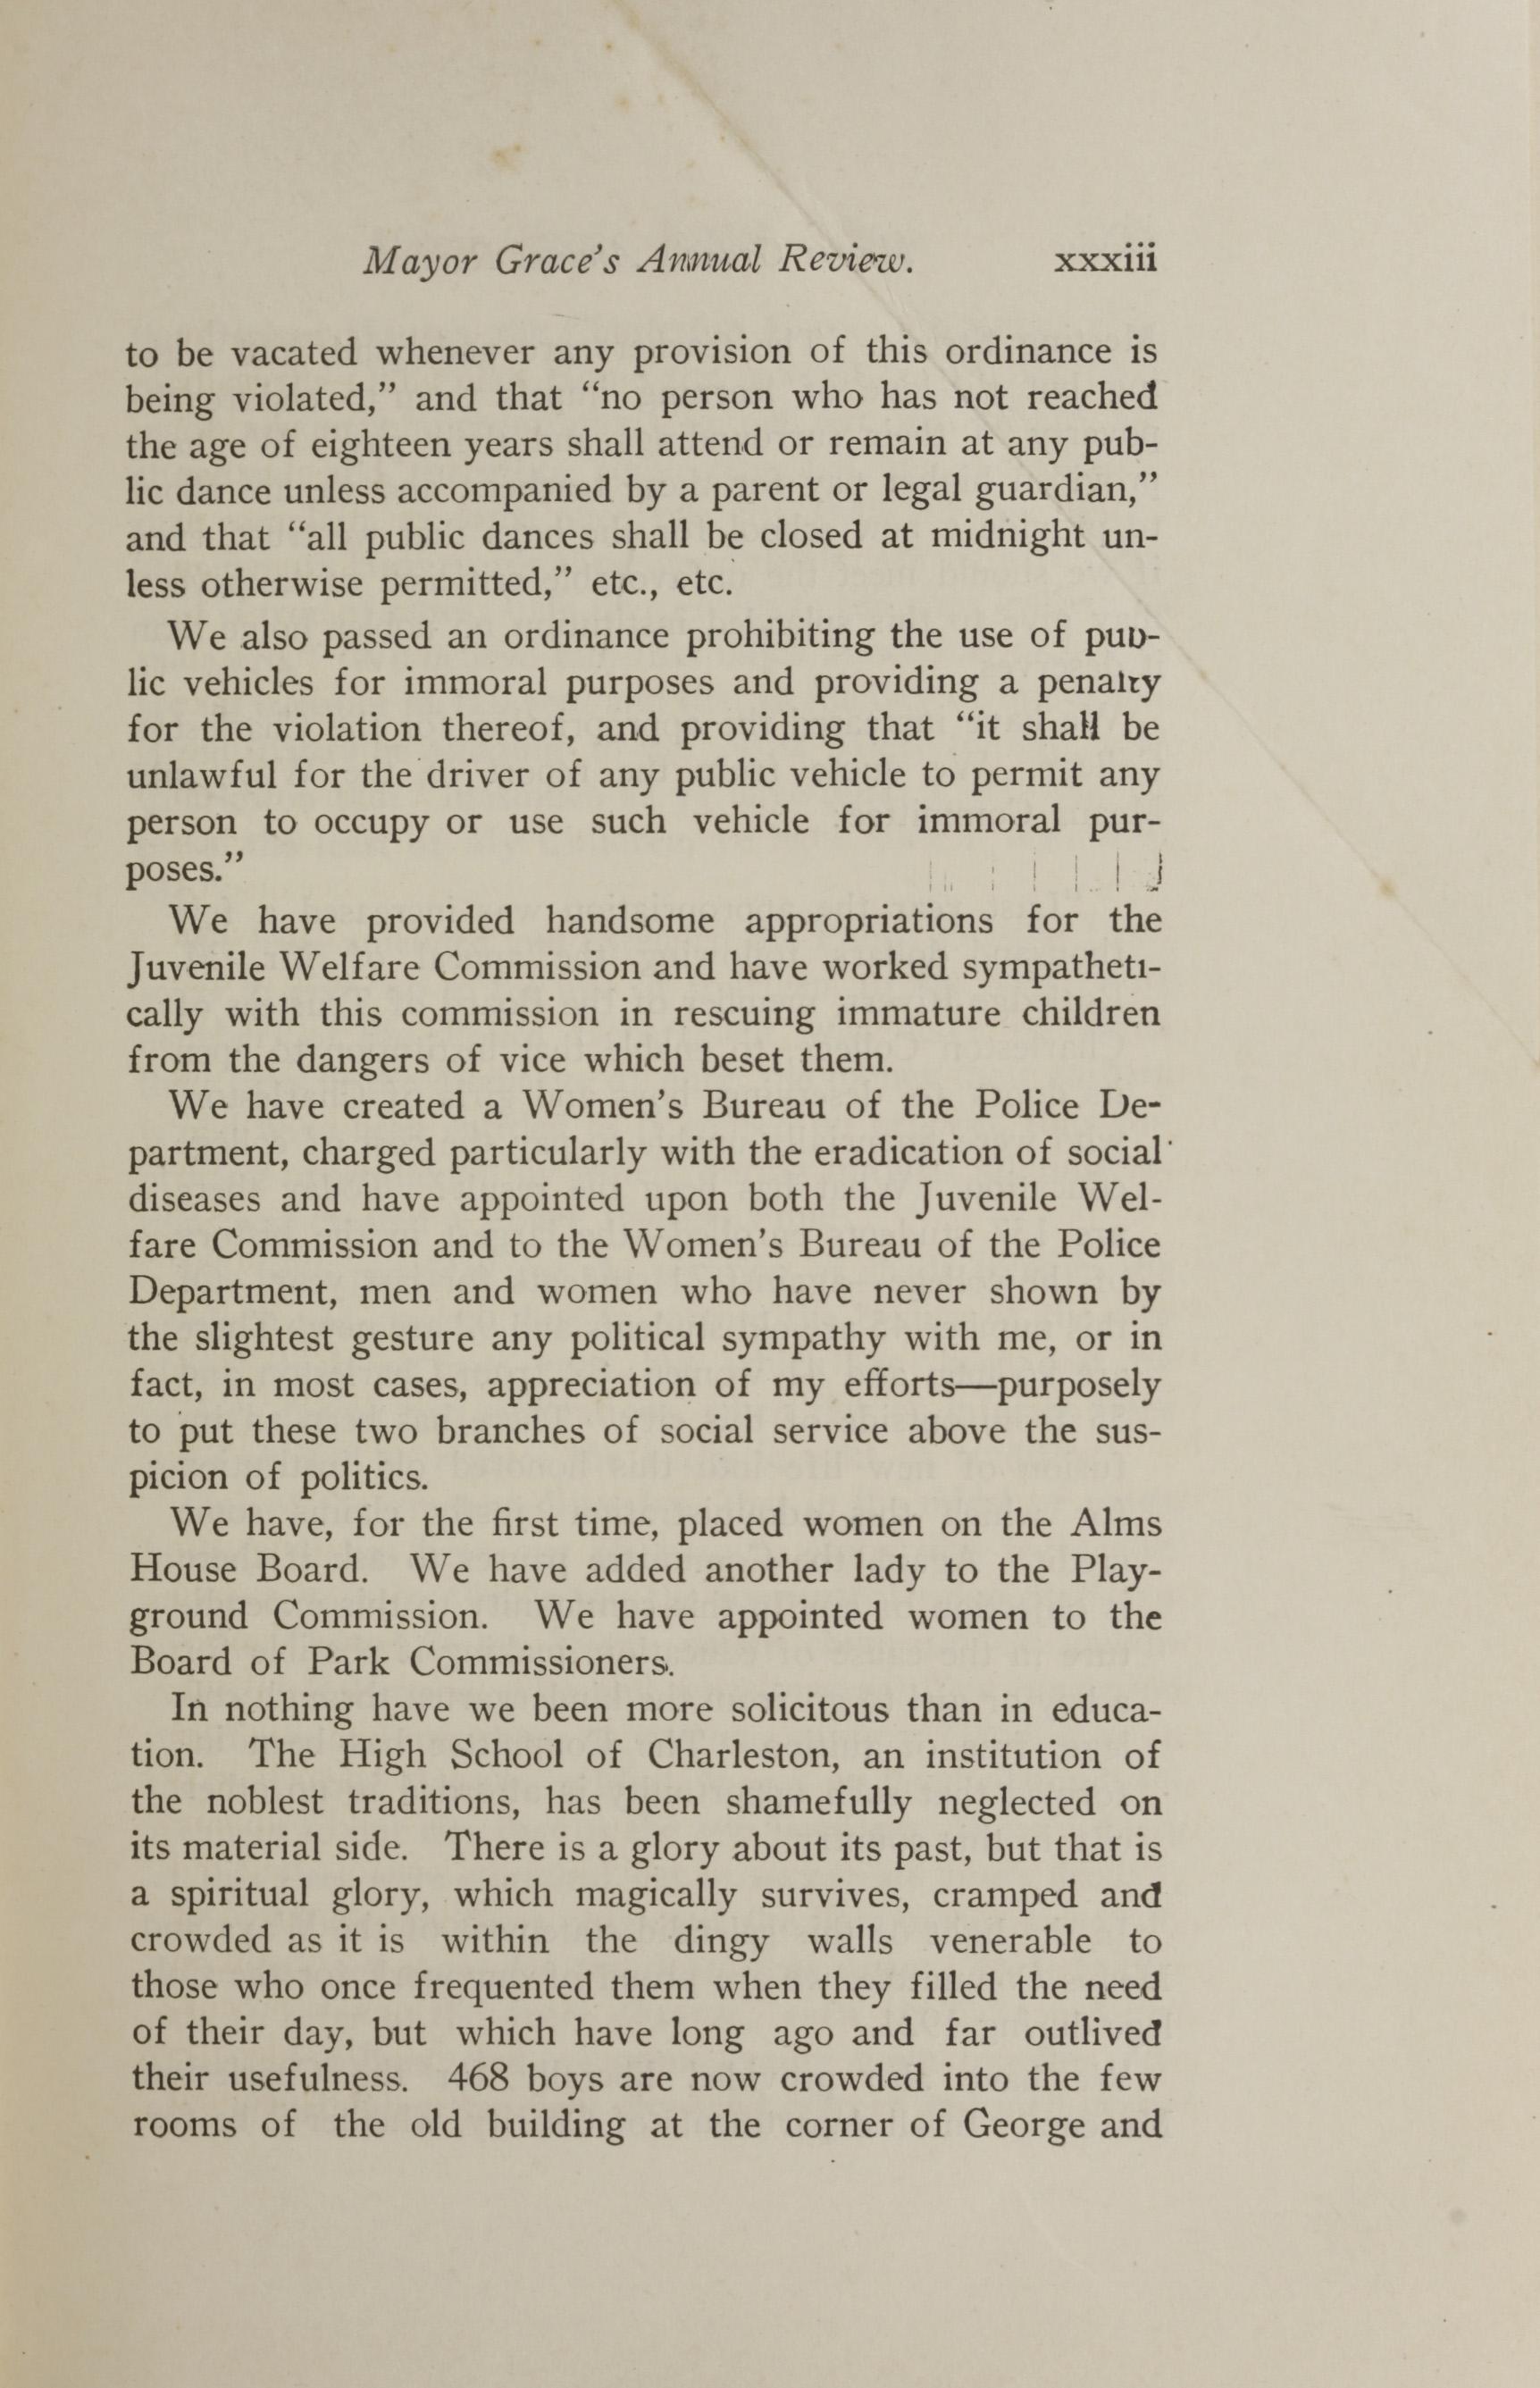 Charleston Yearbook, 1921, page xxxiii